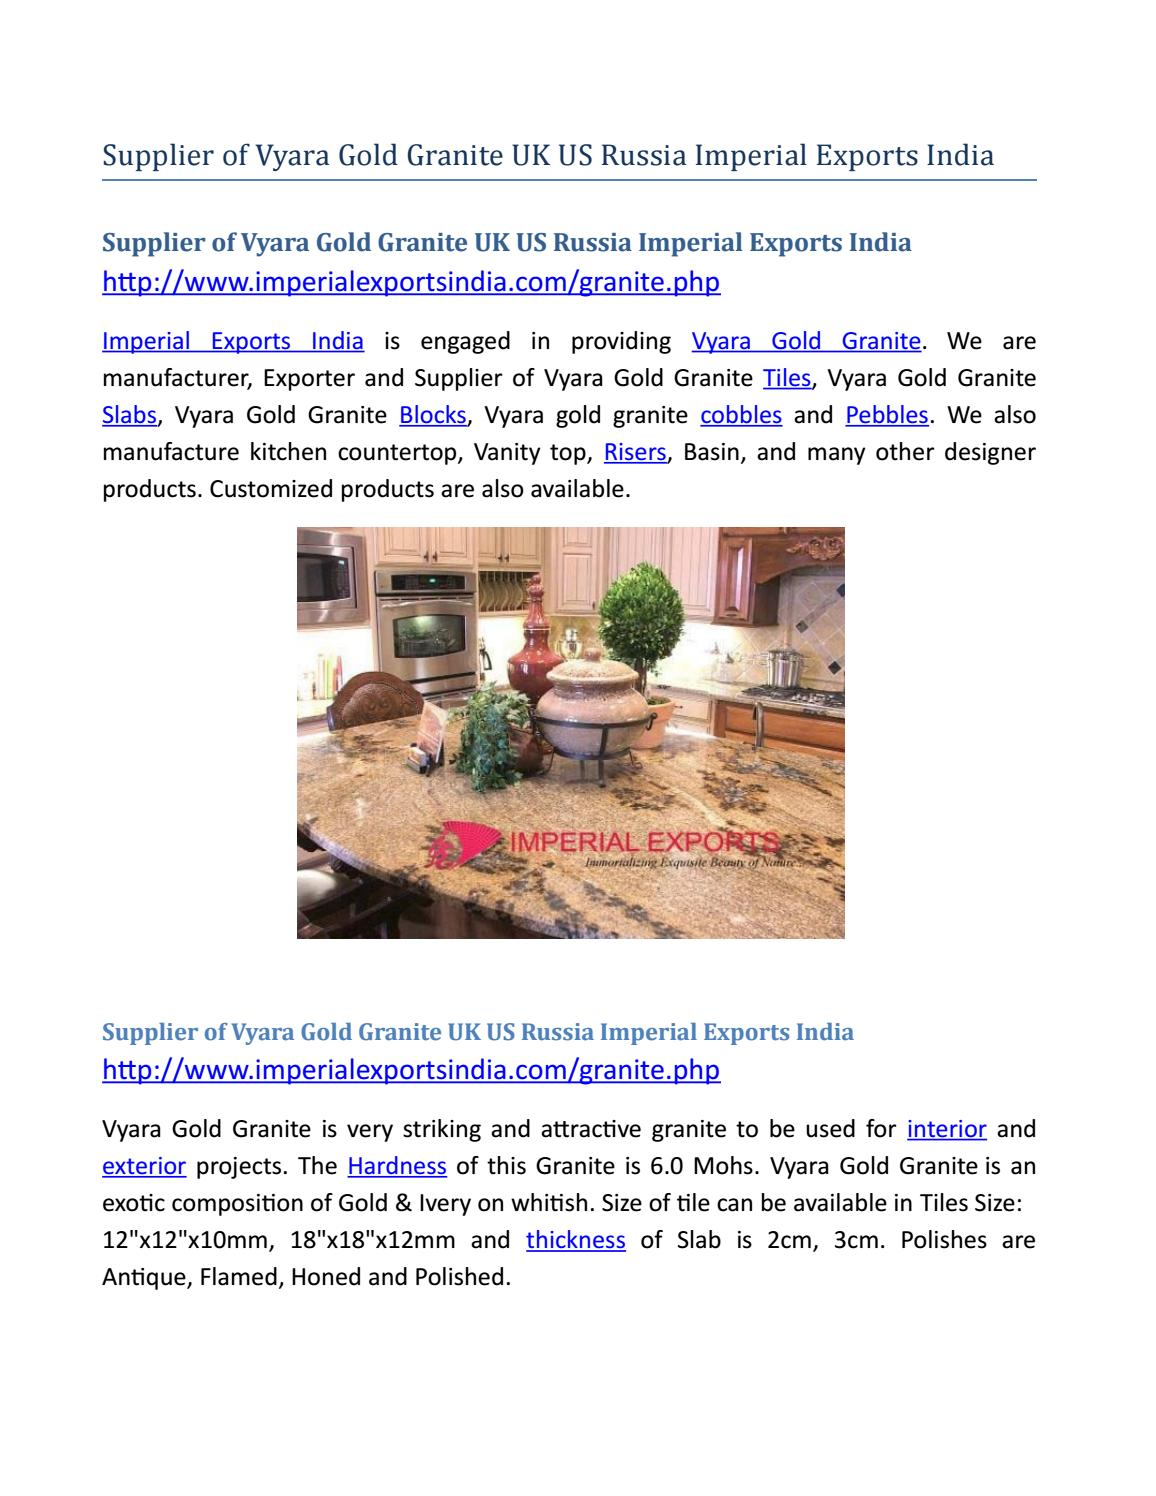 Supplier of Vyara Gold Granite UK US Russia Imperial Exports